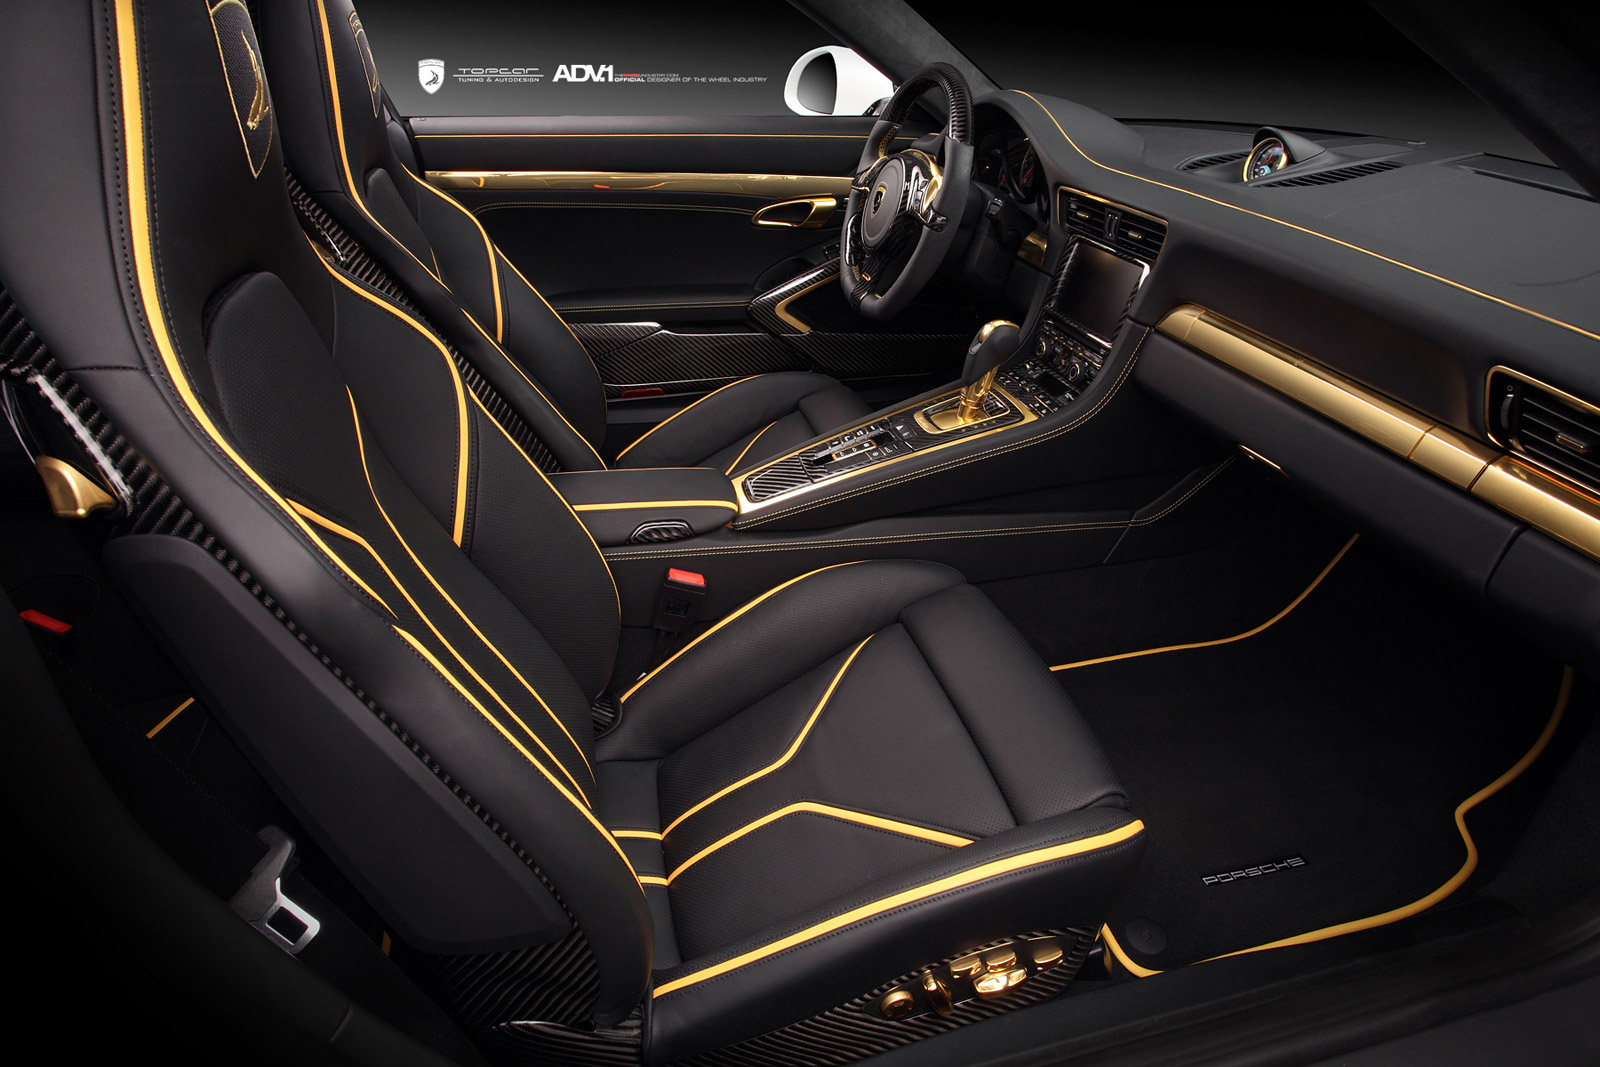 porsche-911-turbo-typ-991-topcar-stinger-gtr-024